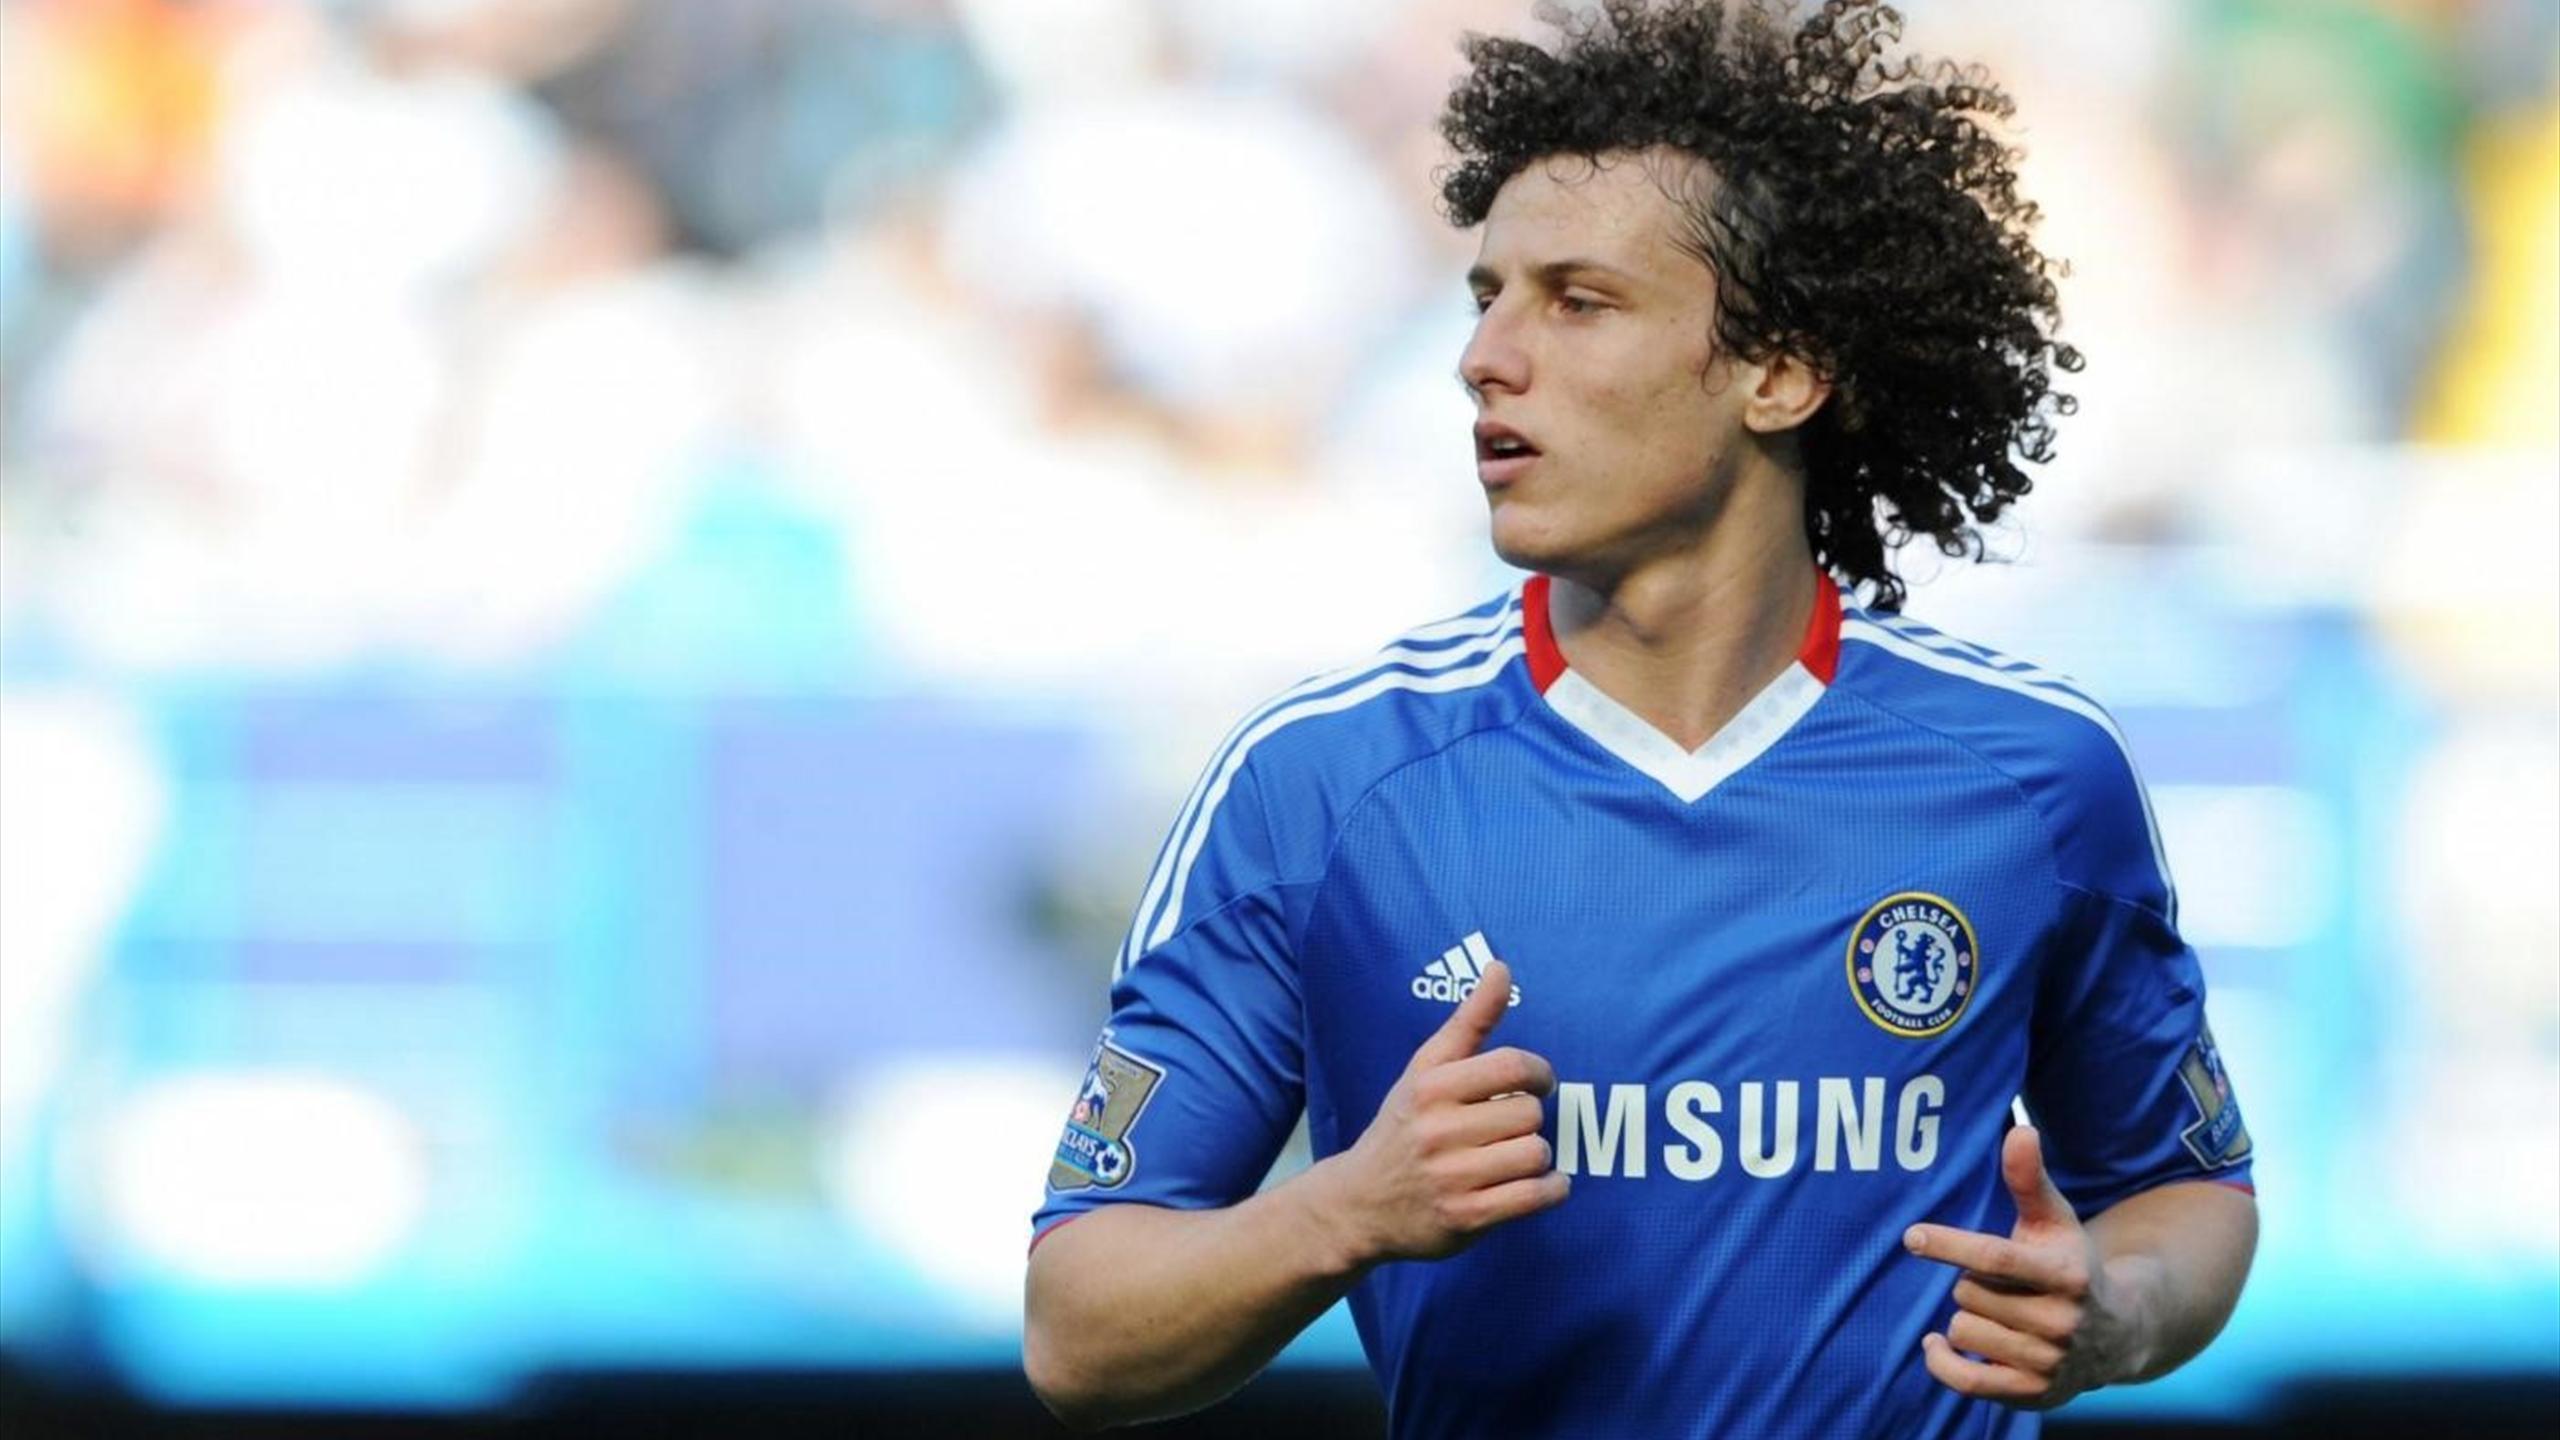 David Luiz - Chelsea-Wigan - Premier League 2010/2011 - LaPresse